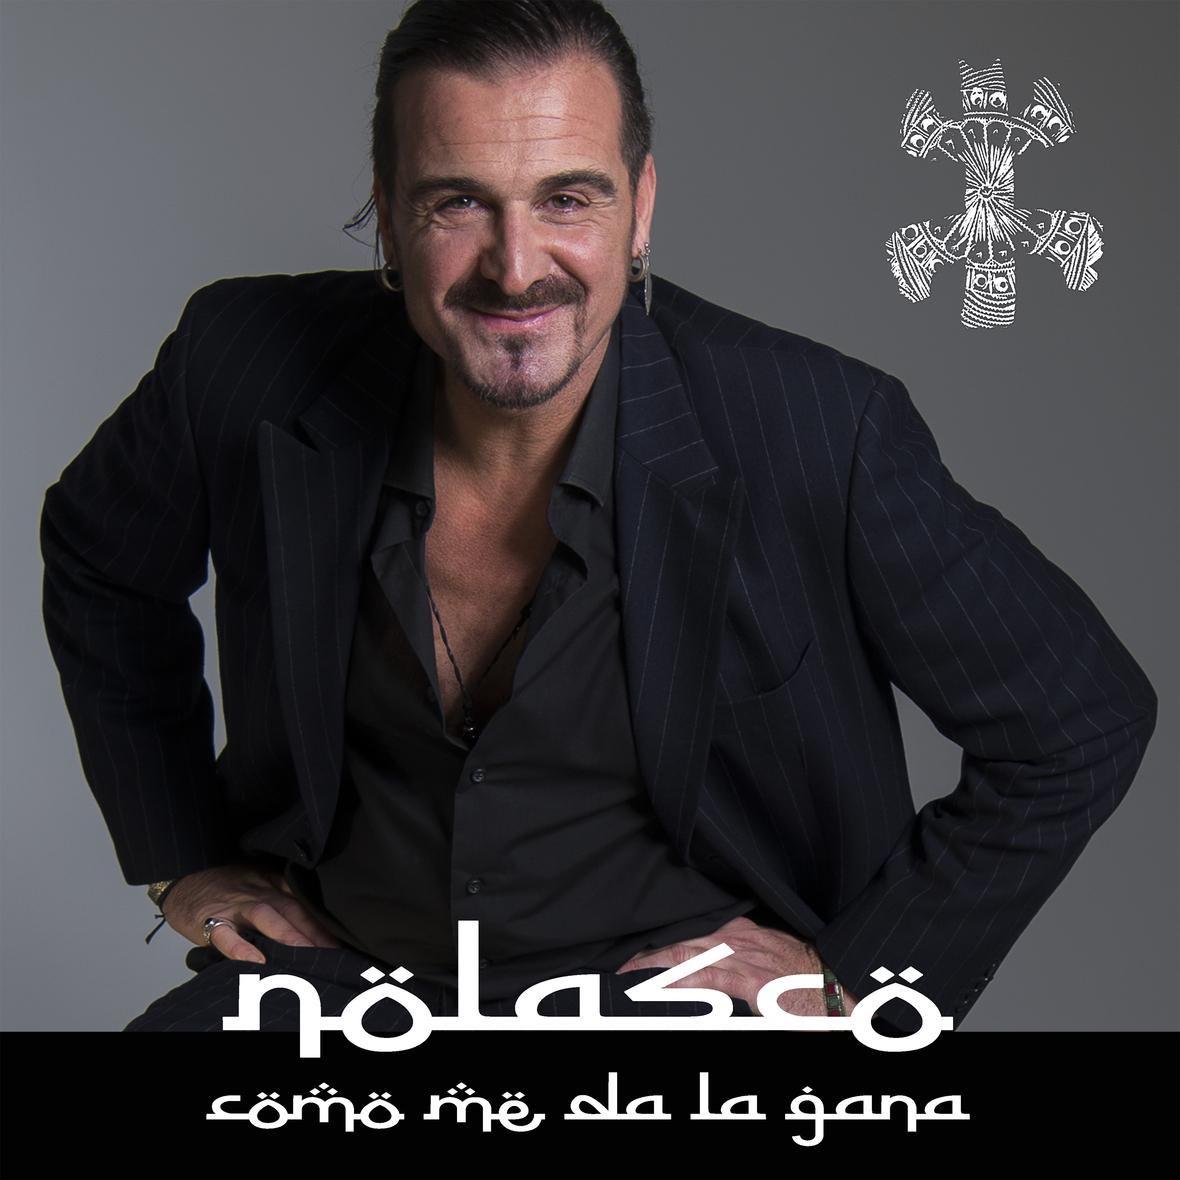 Nolasco publica su nuevo disco, Como me da la gana